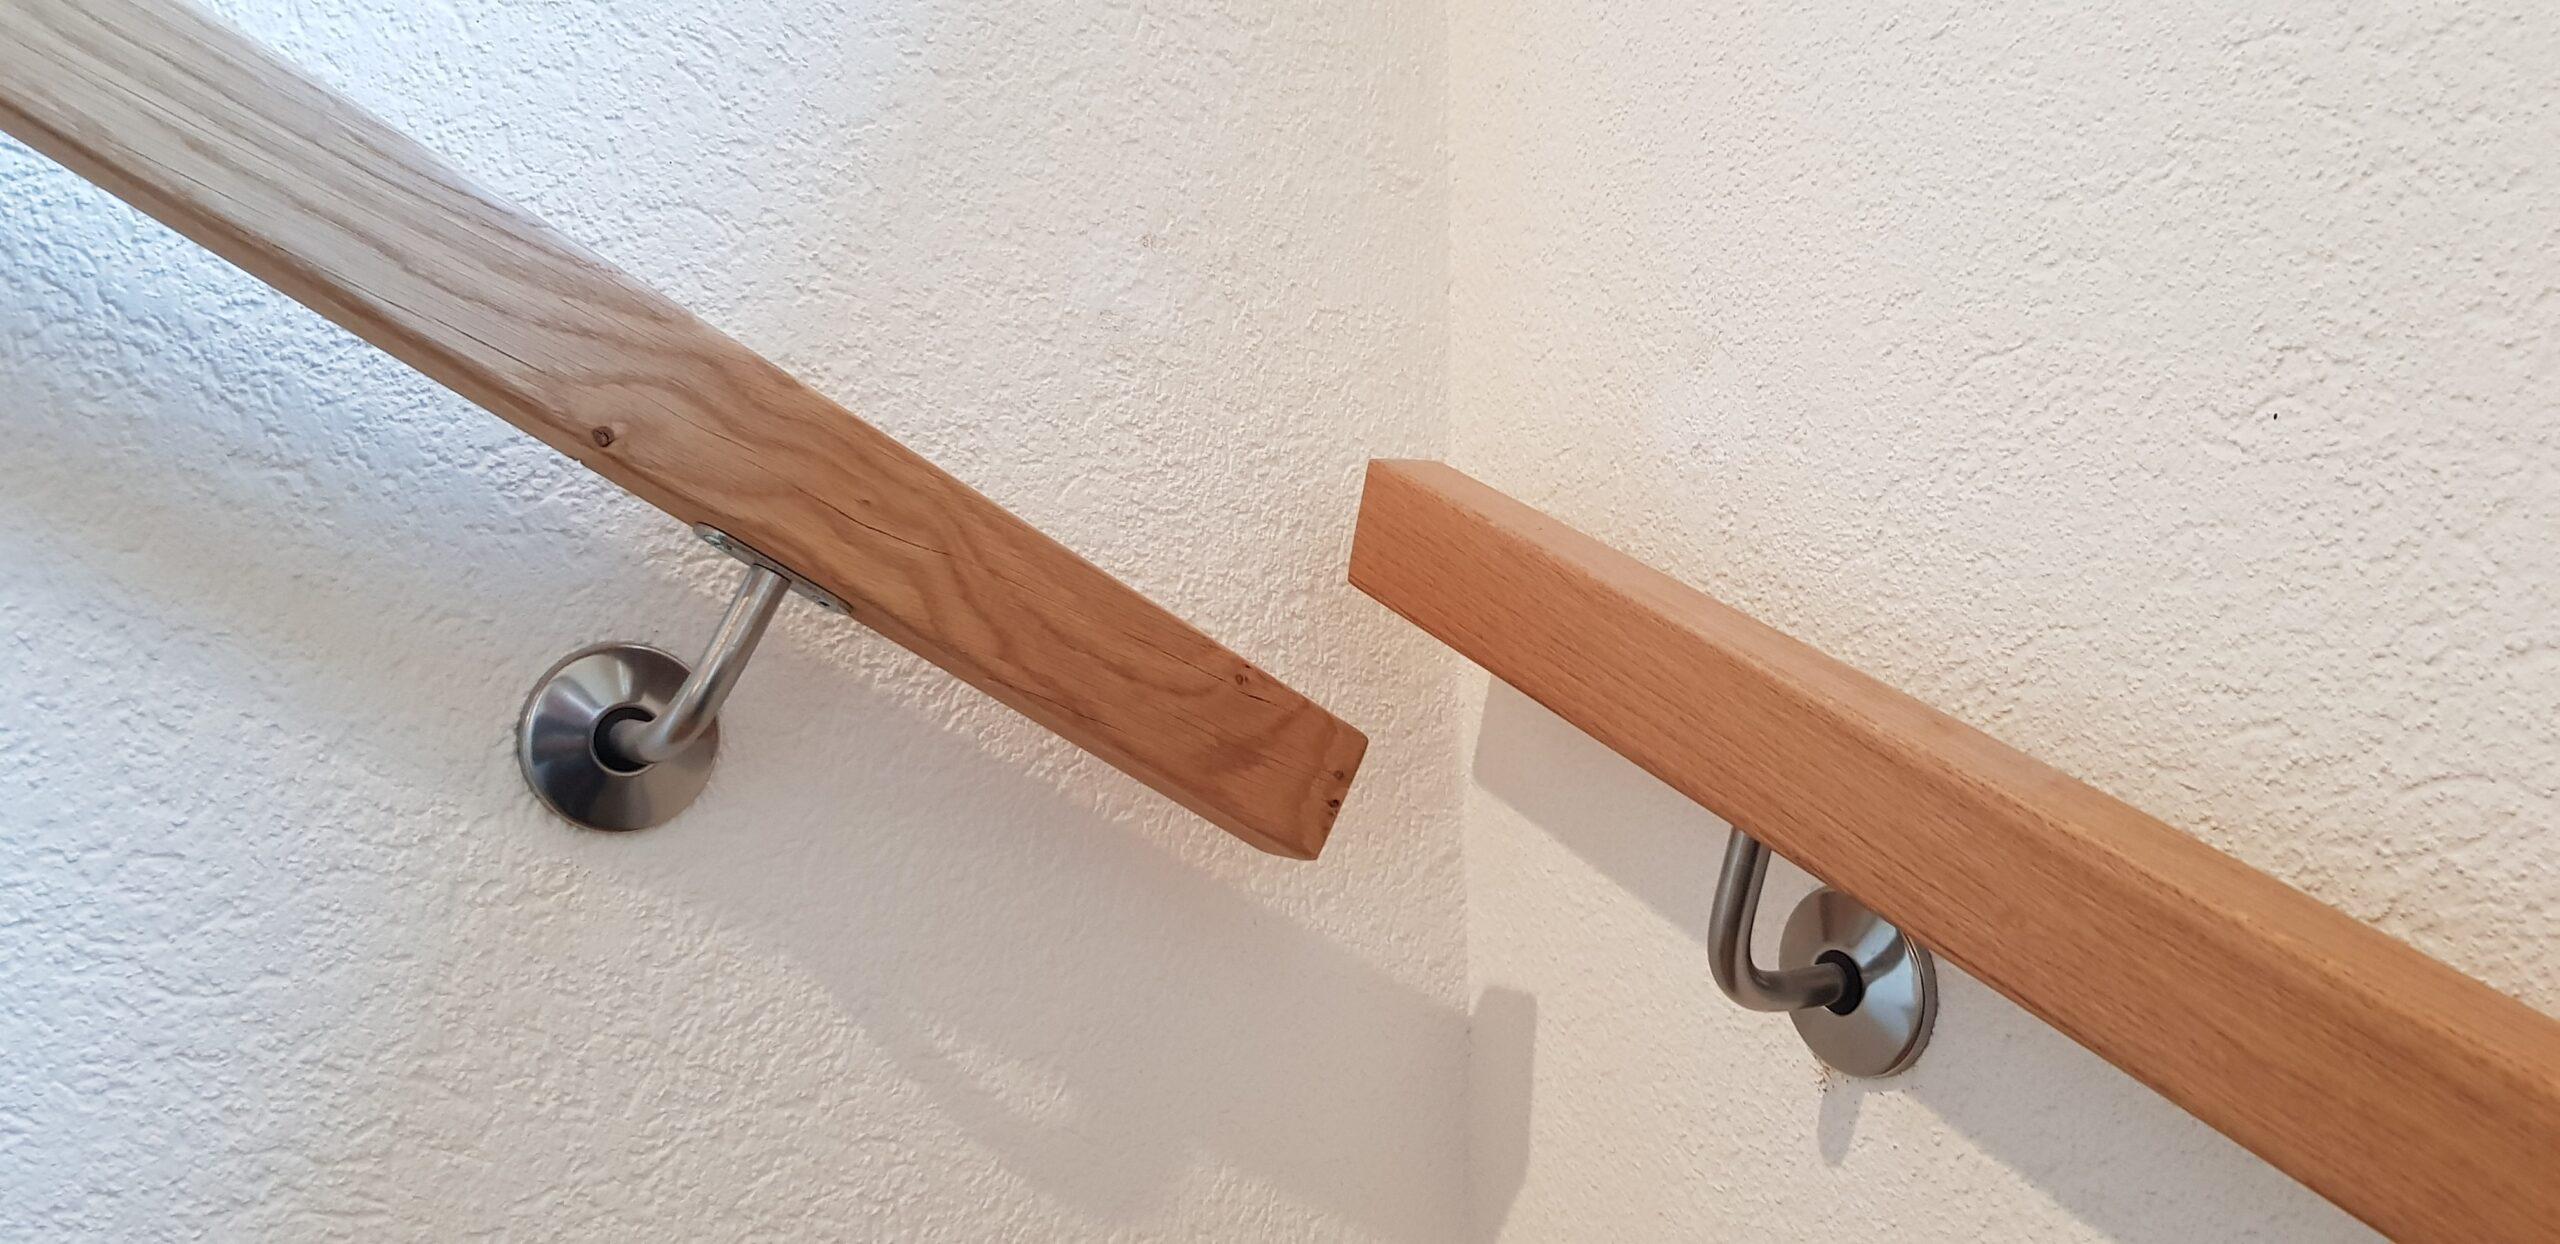 Wooddesign_Treppen_Teppengeländer_Holztreppen_Treppenverkleidung_Handlauf_Parkettverkleidung_Treppenprofil (2)-min